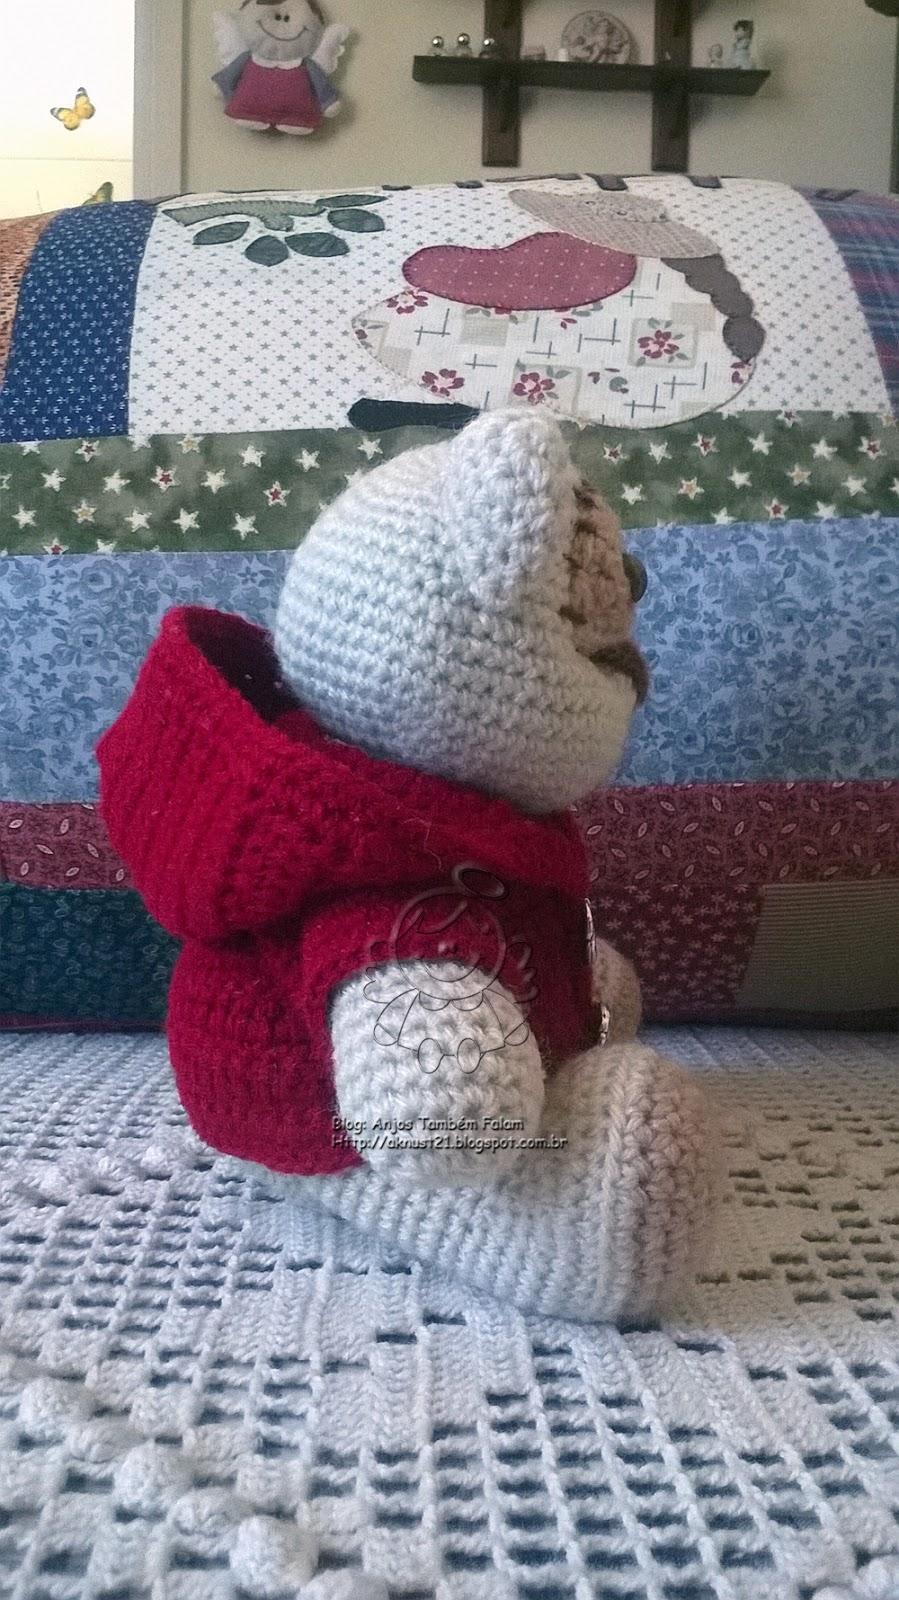 Cuddle Me Bunny amigurumi pattern | Amigurumi pattern, Crochet ... | 1600x899